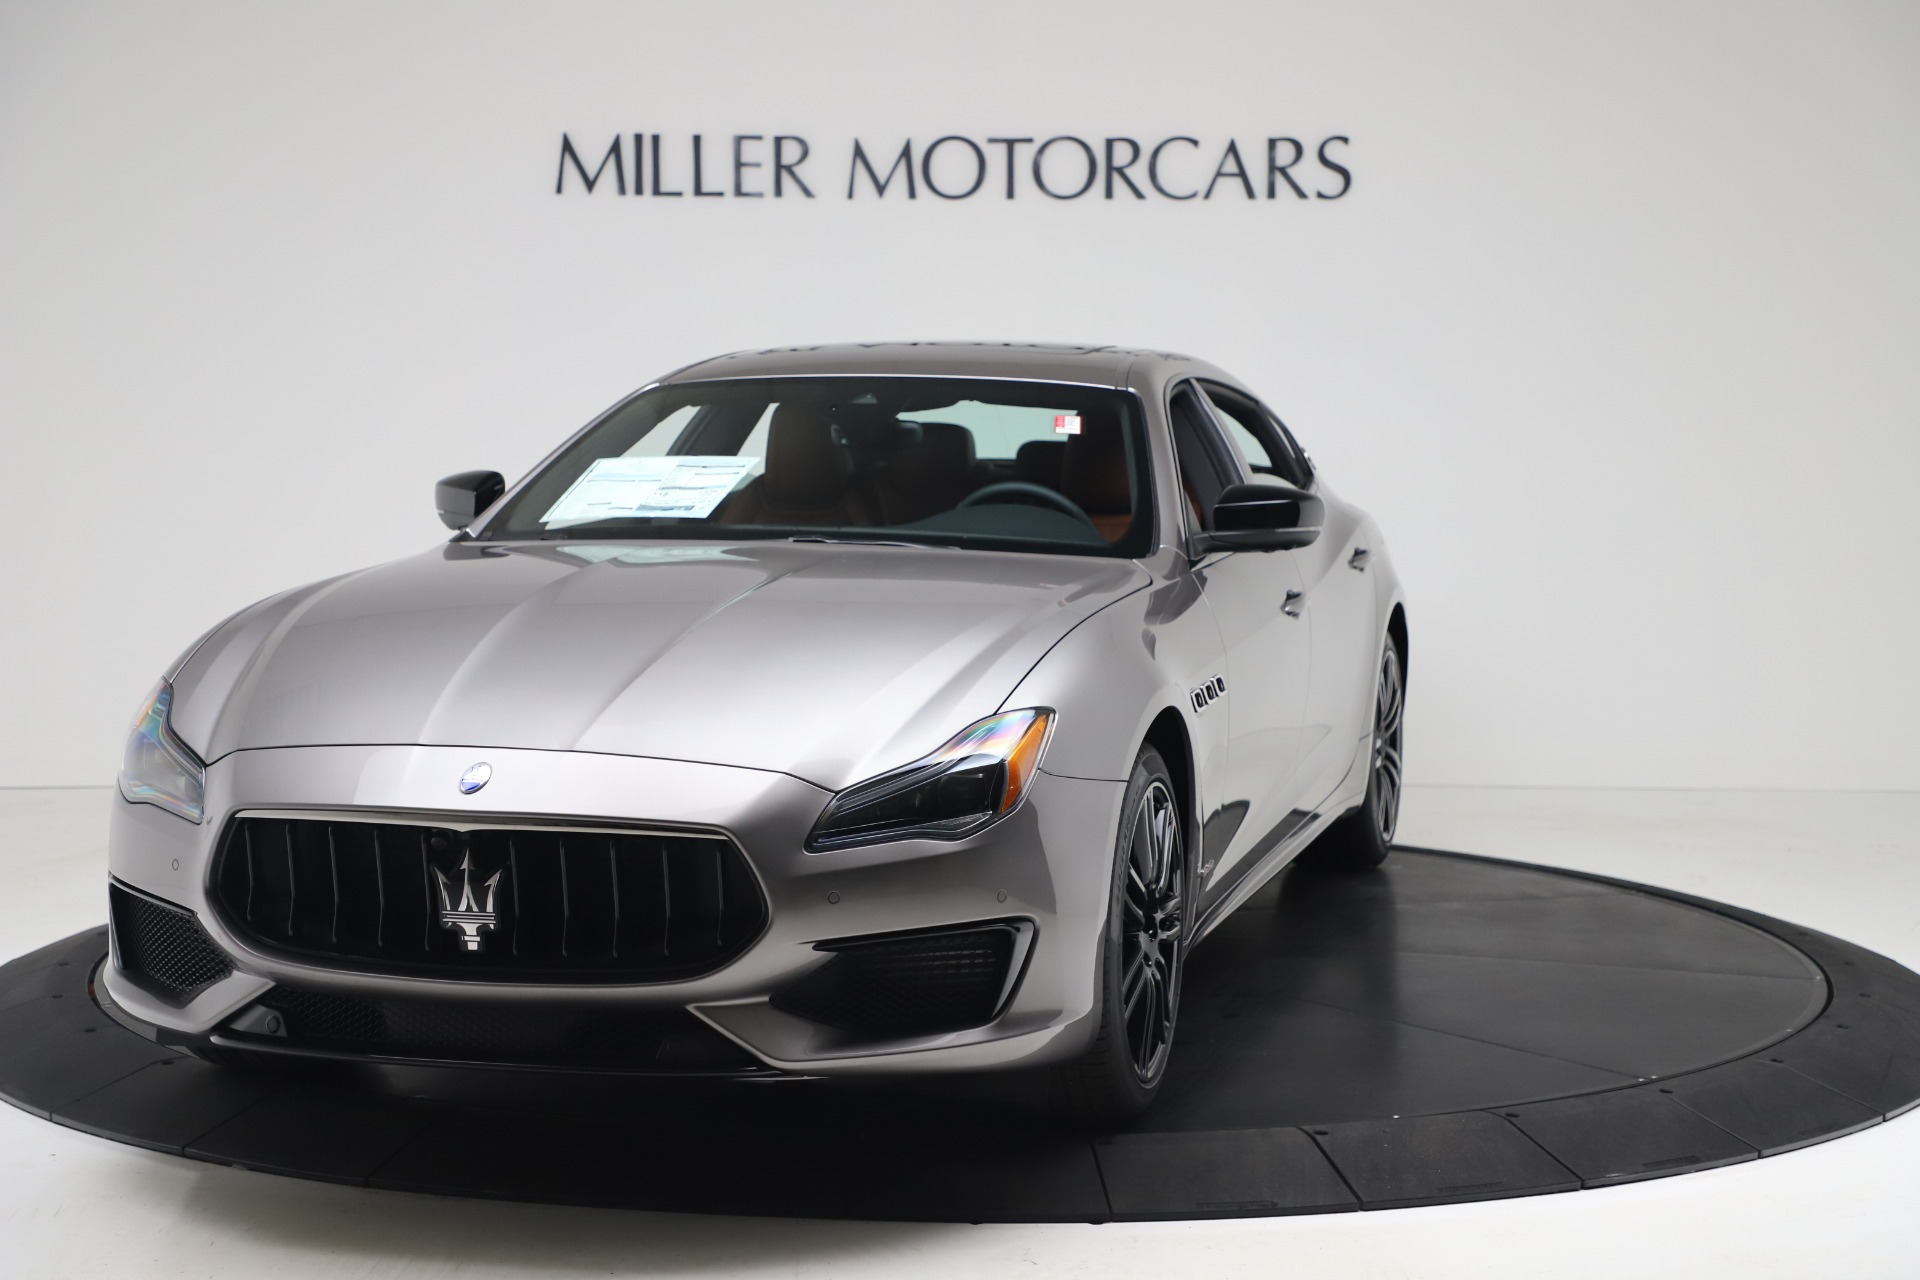 New 2020 Maserati Quattroporte S Q4 GranSport for sale $120,285 at Bentley Greenwich in Greenwich CT 06830 1